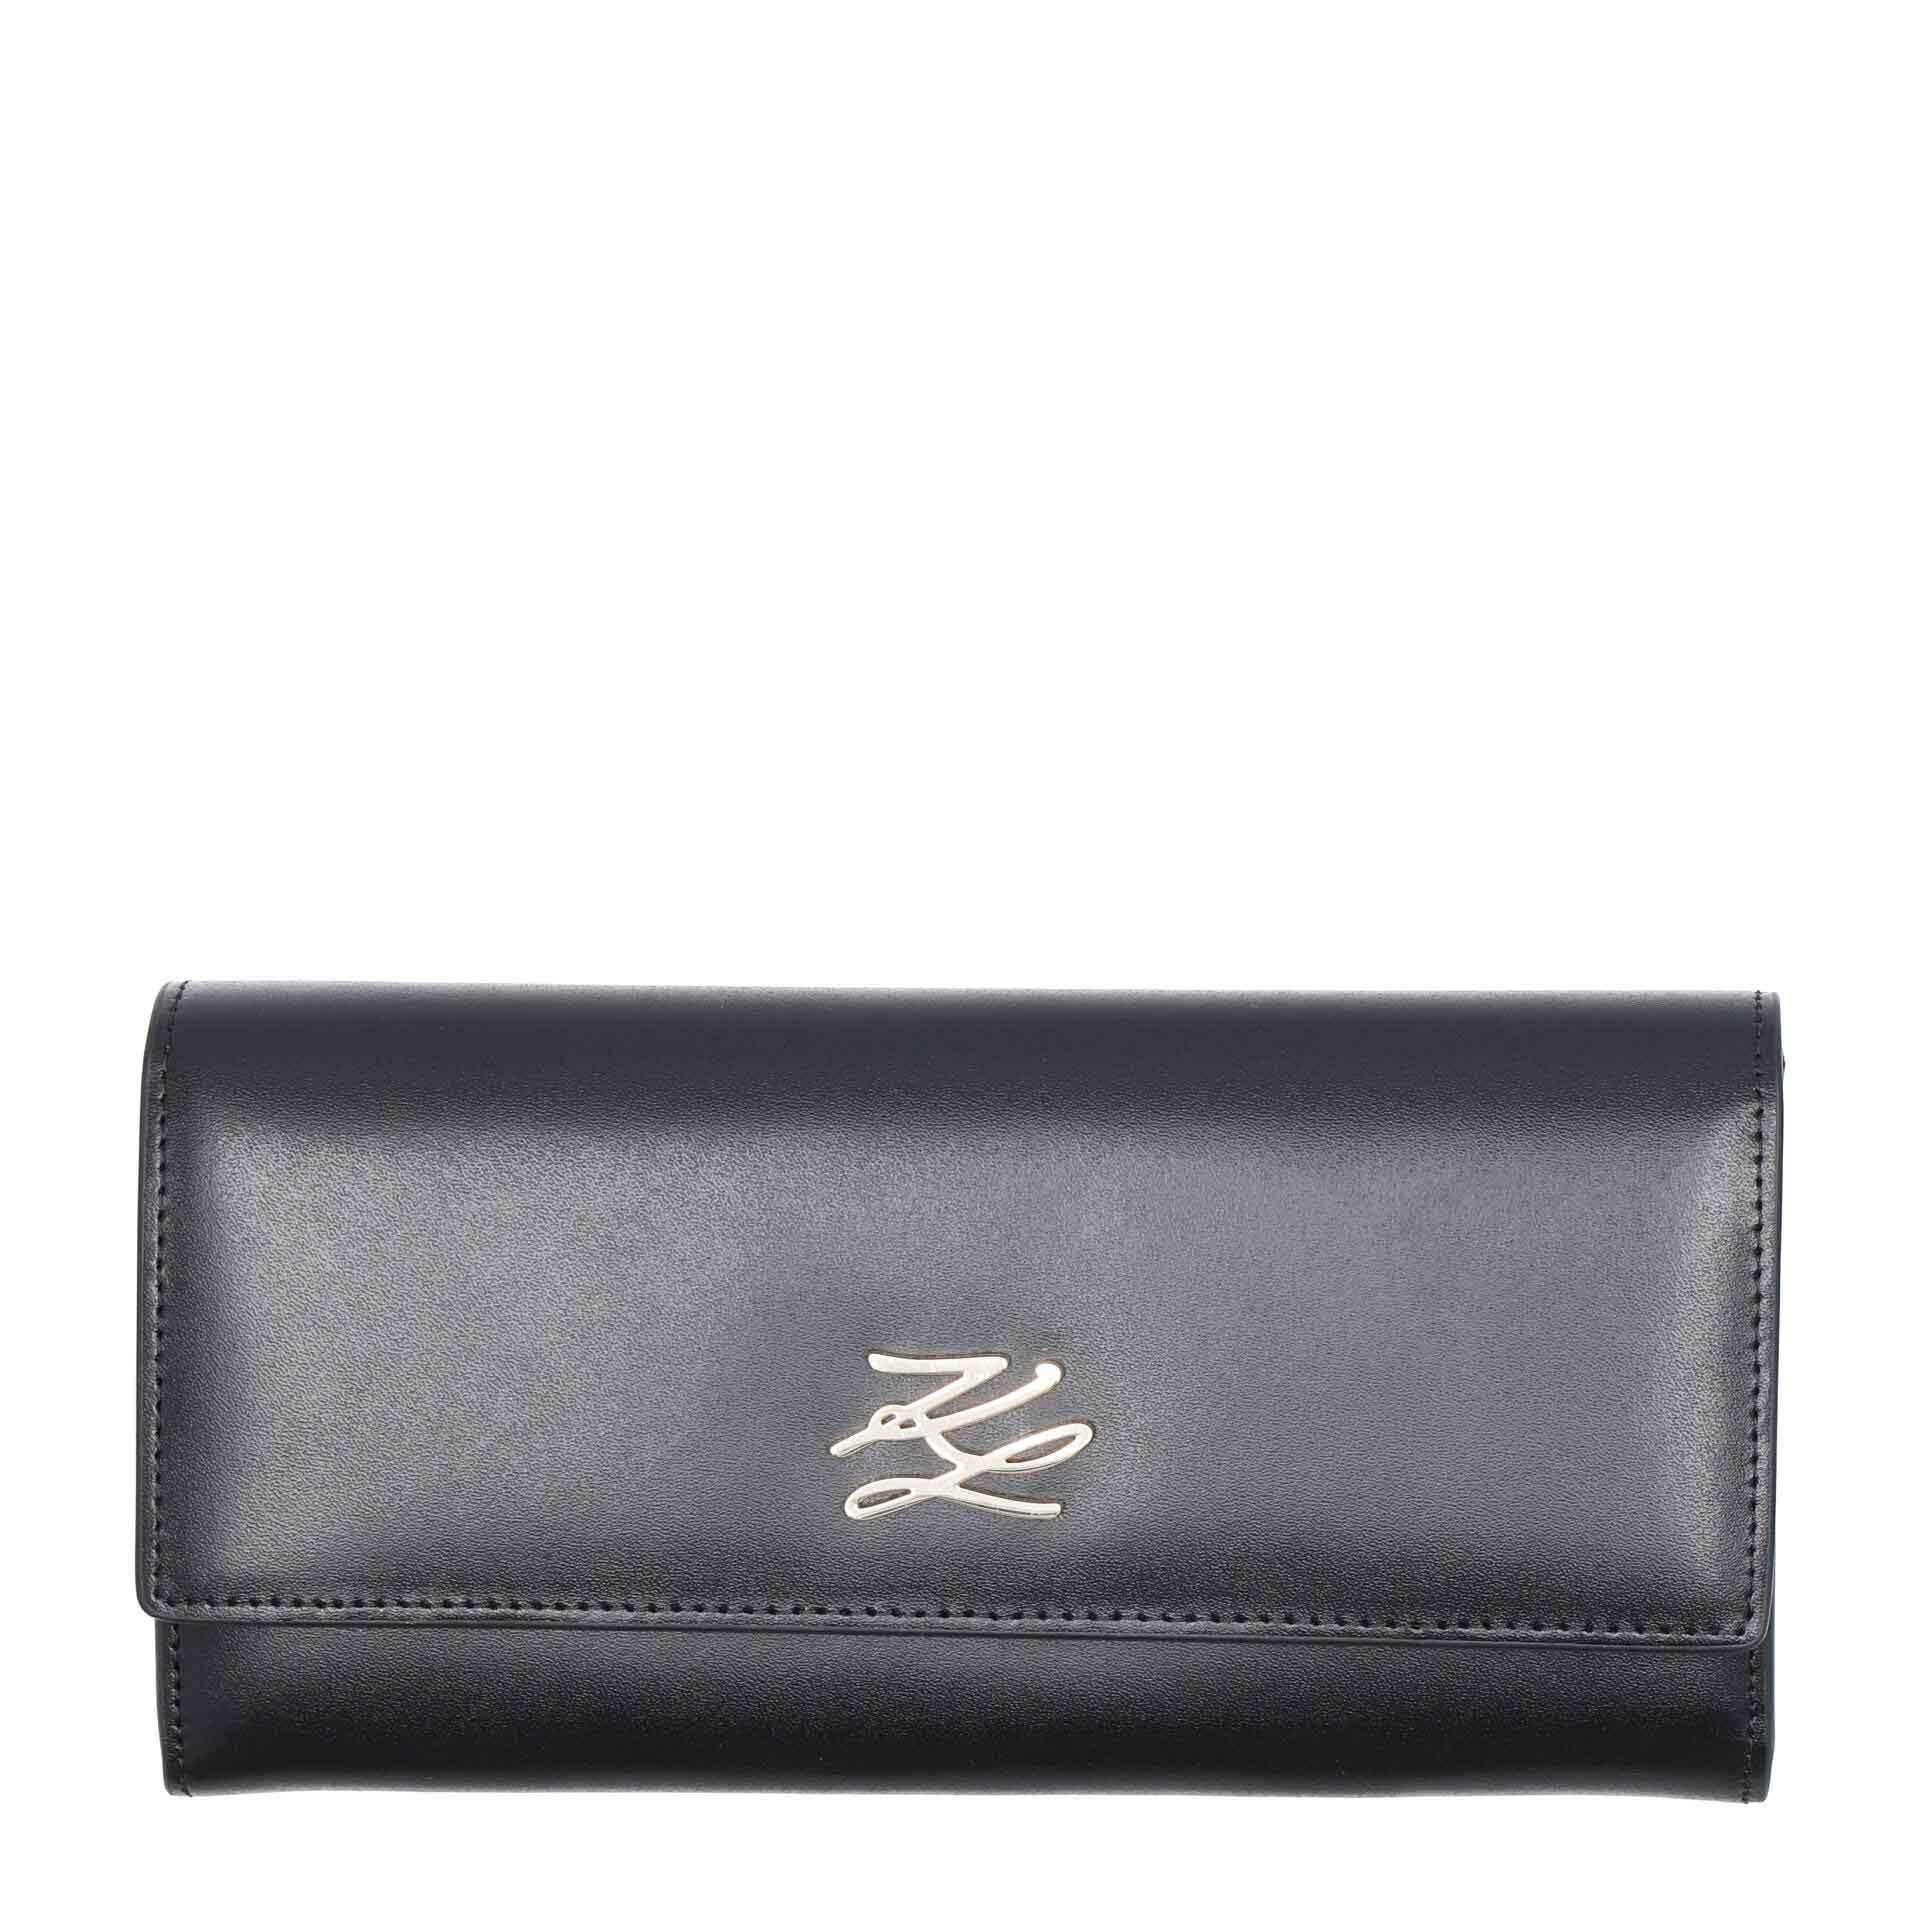 Karl Lagerfeld K/Autograph Damengeldbörse black gold